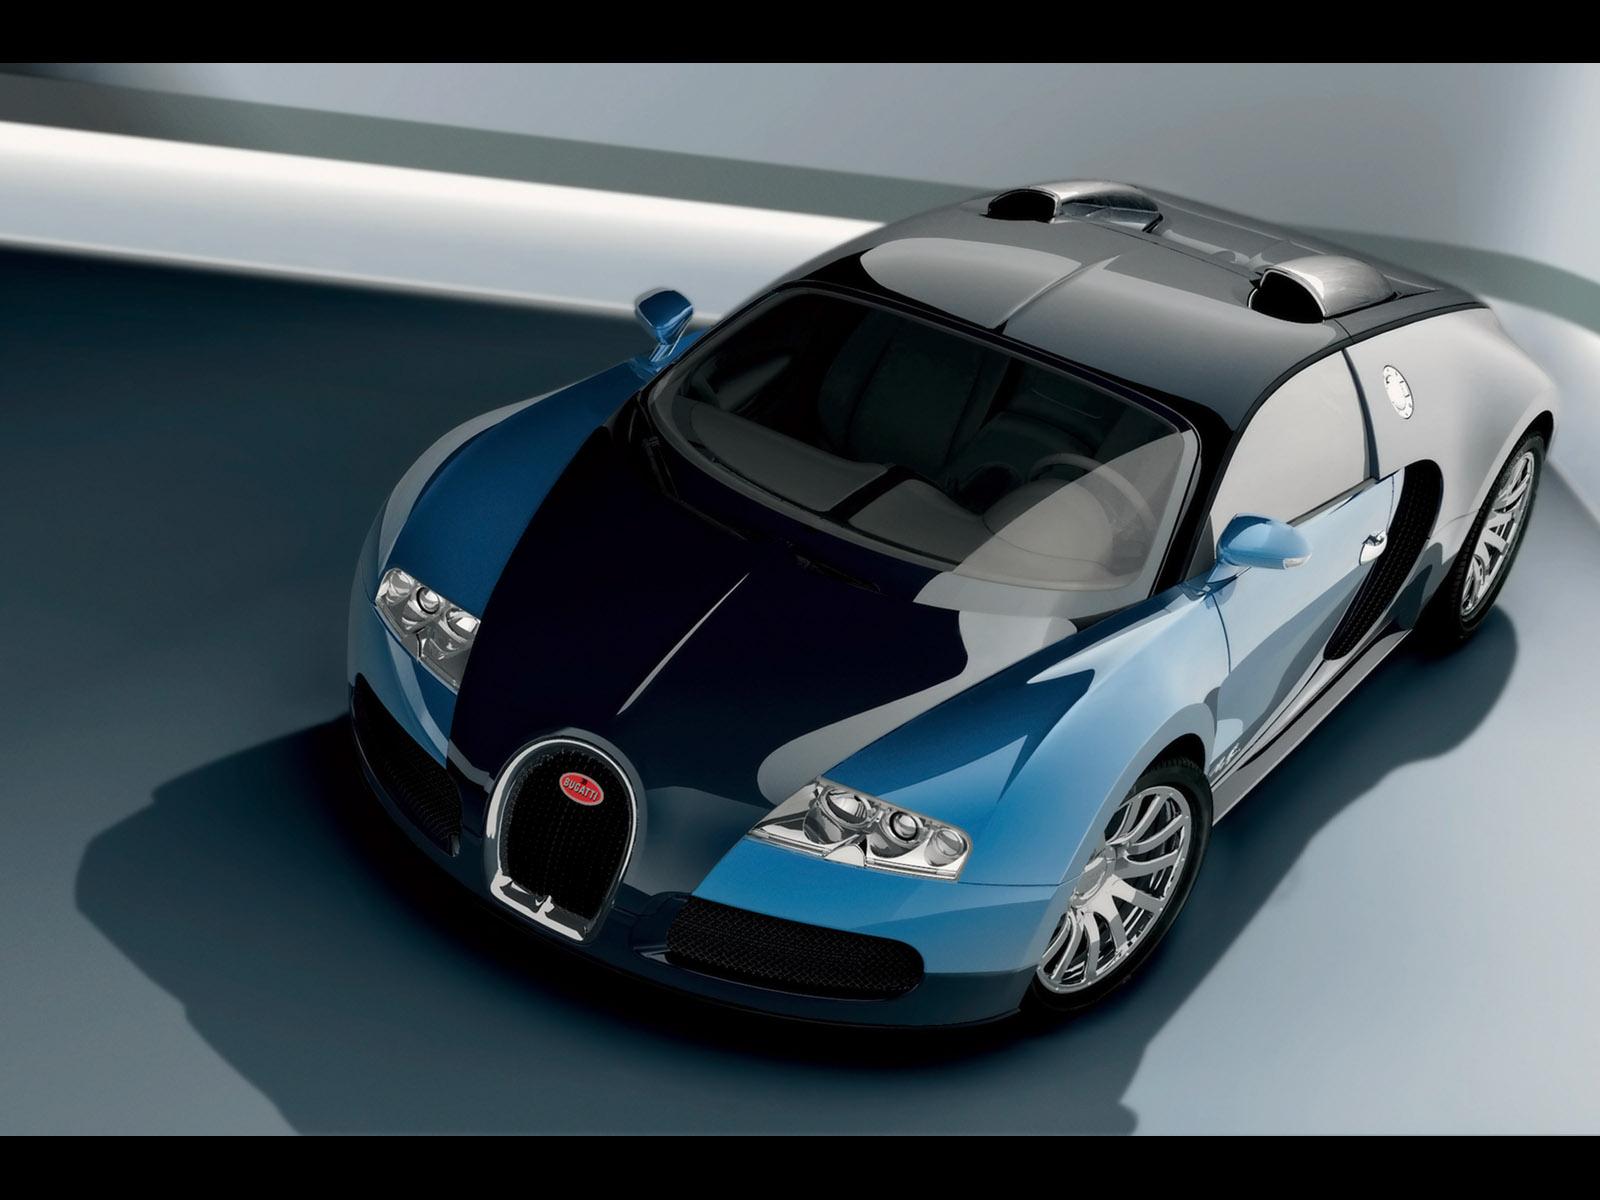 Bugatti-Veyron-10 Fascinating Bugatti Veyron Price south African Rands Cars Trend